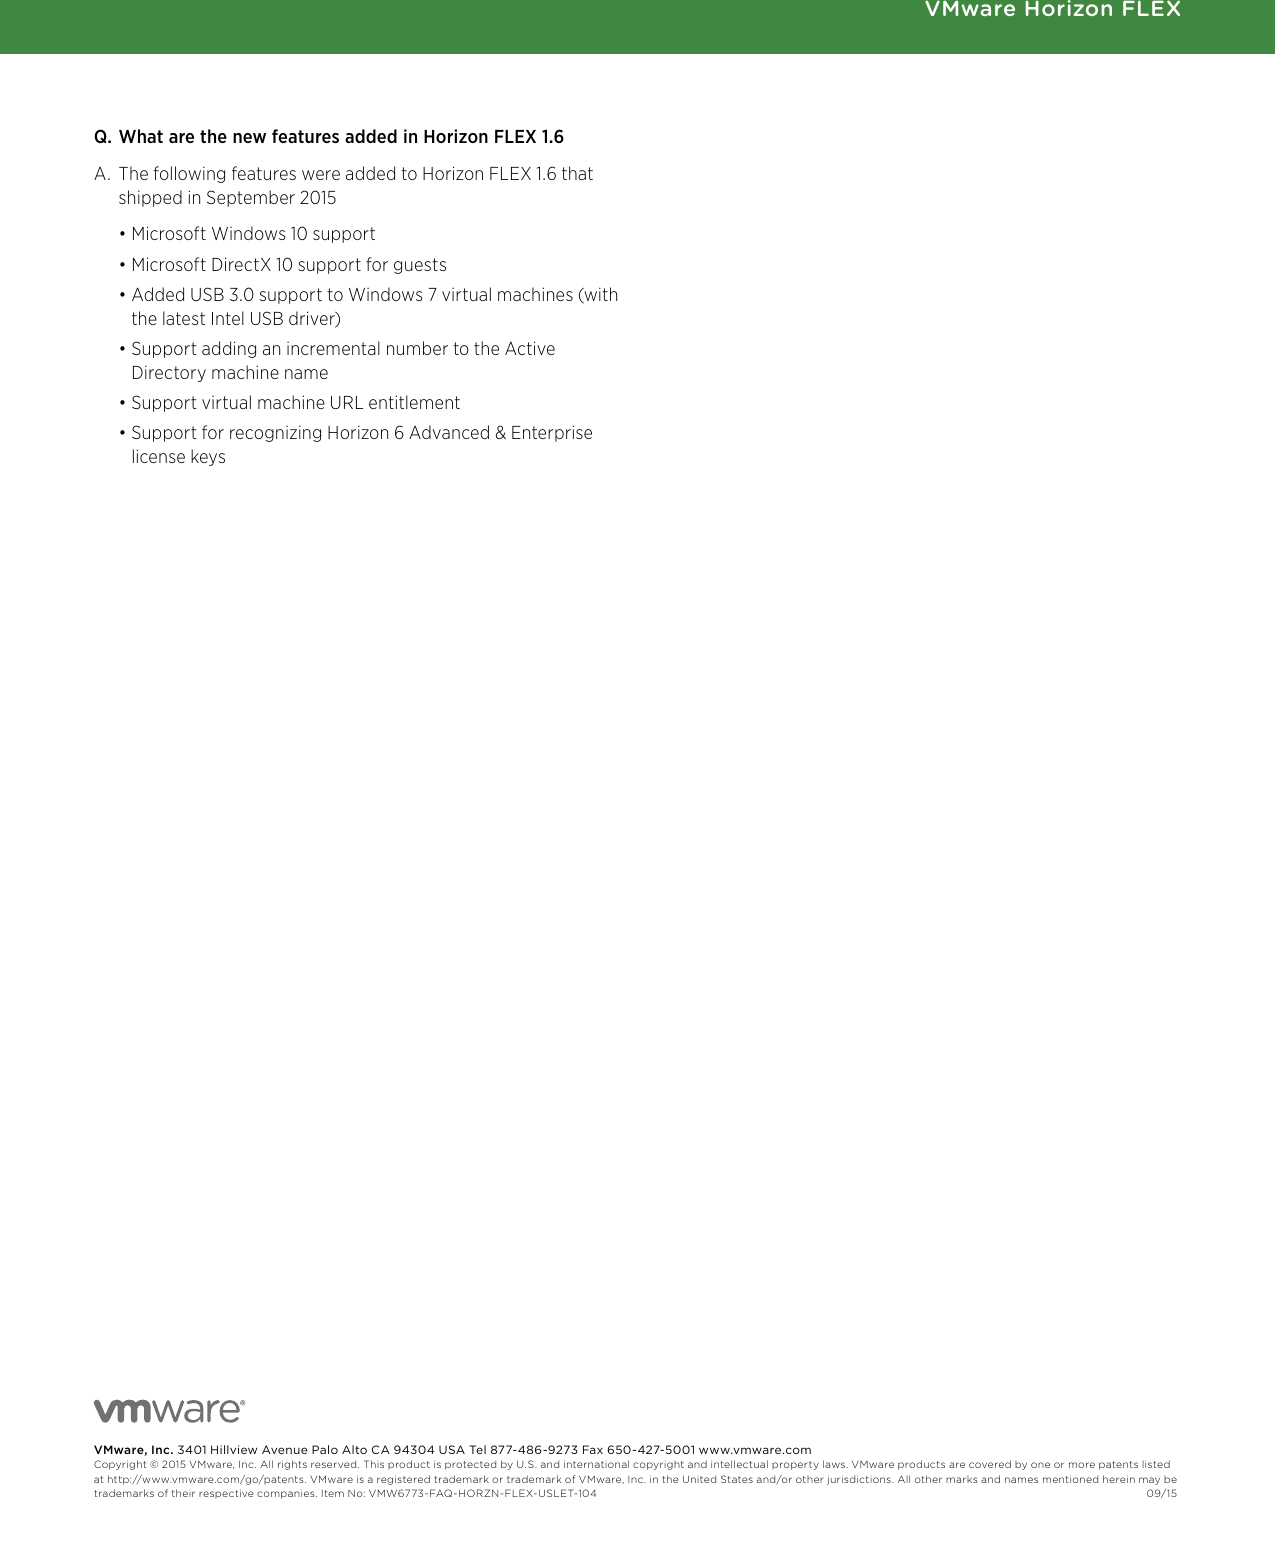 VMware Horizon FLEX FAQ